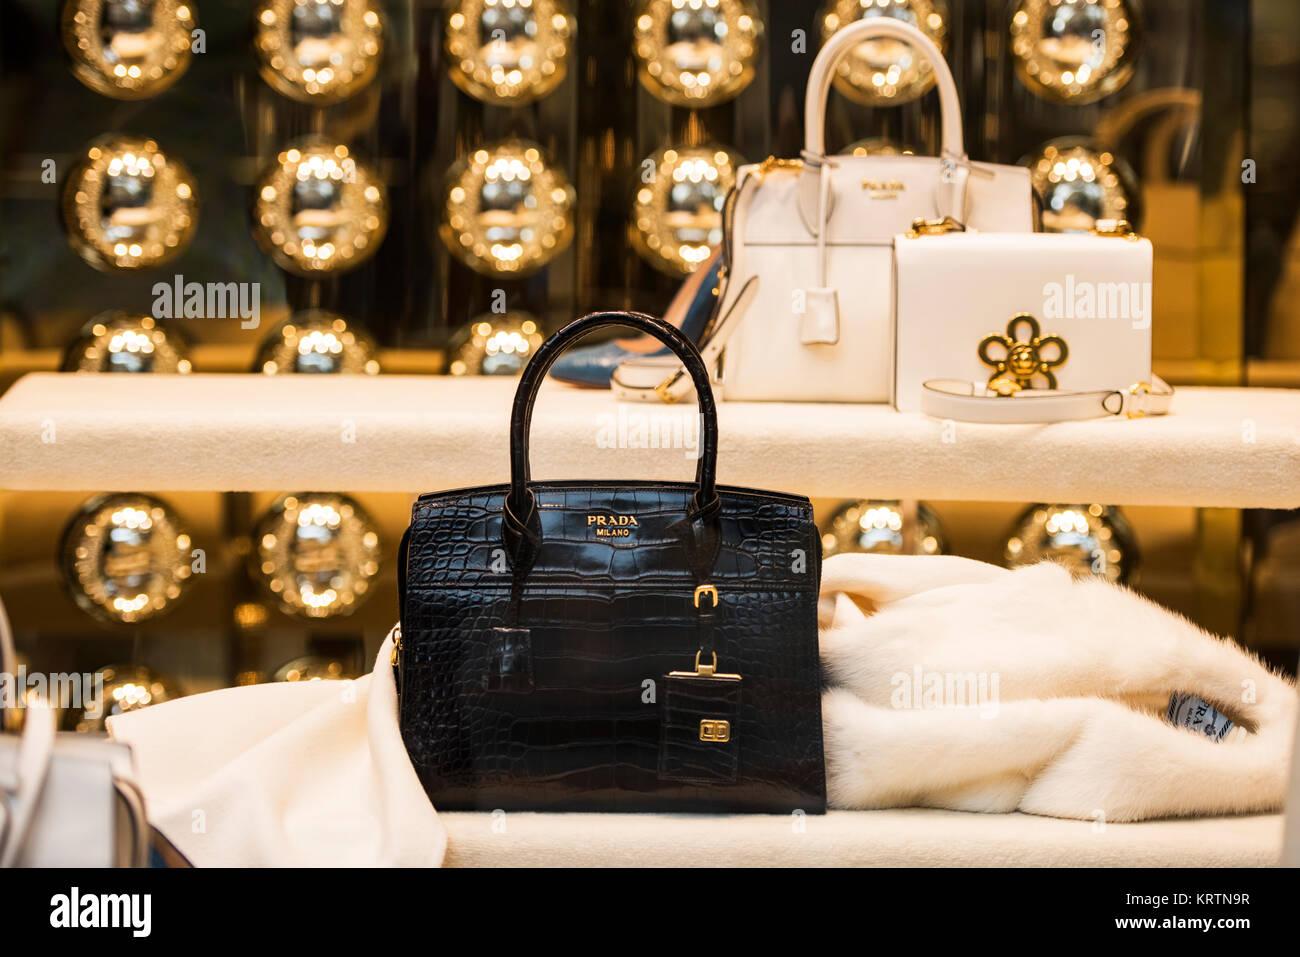 3b03c7188ee6 Prada Handbags Stock Photos   Prada Handbags Stock Images - Alamy